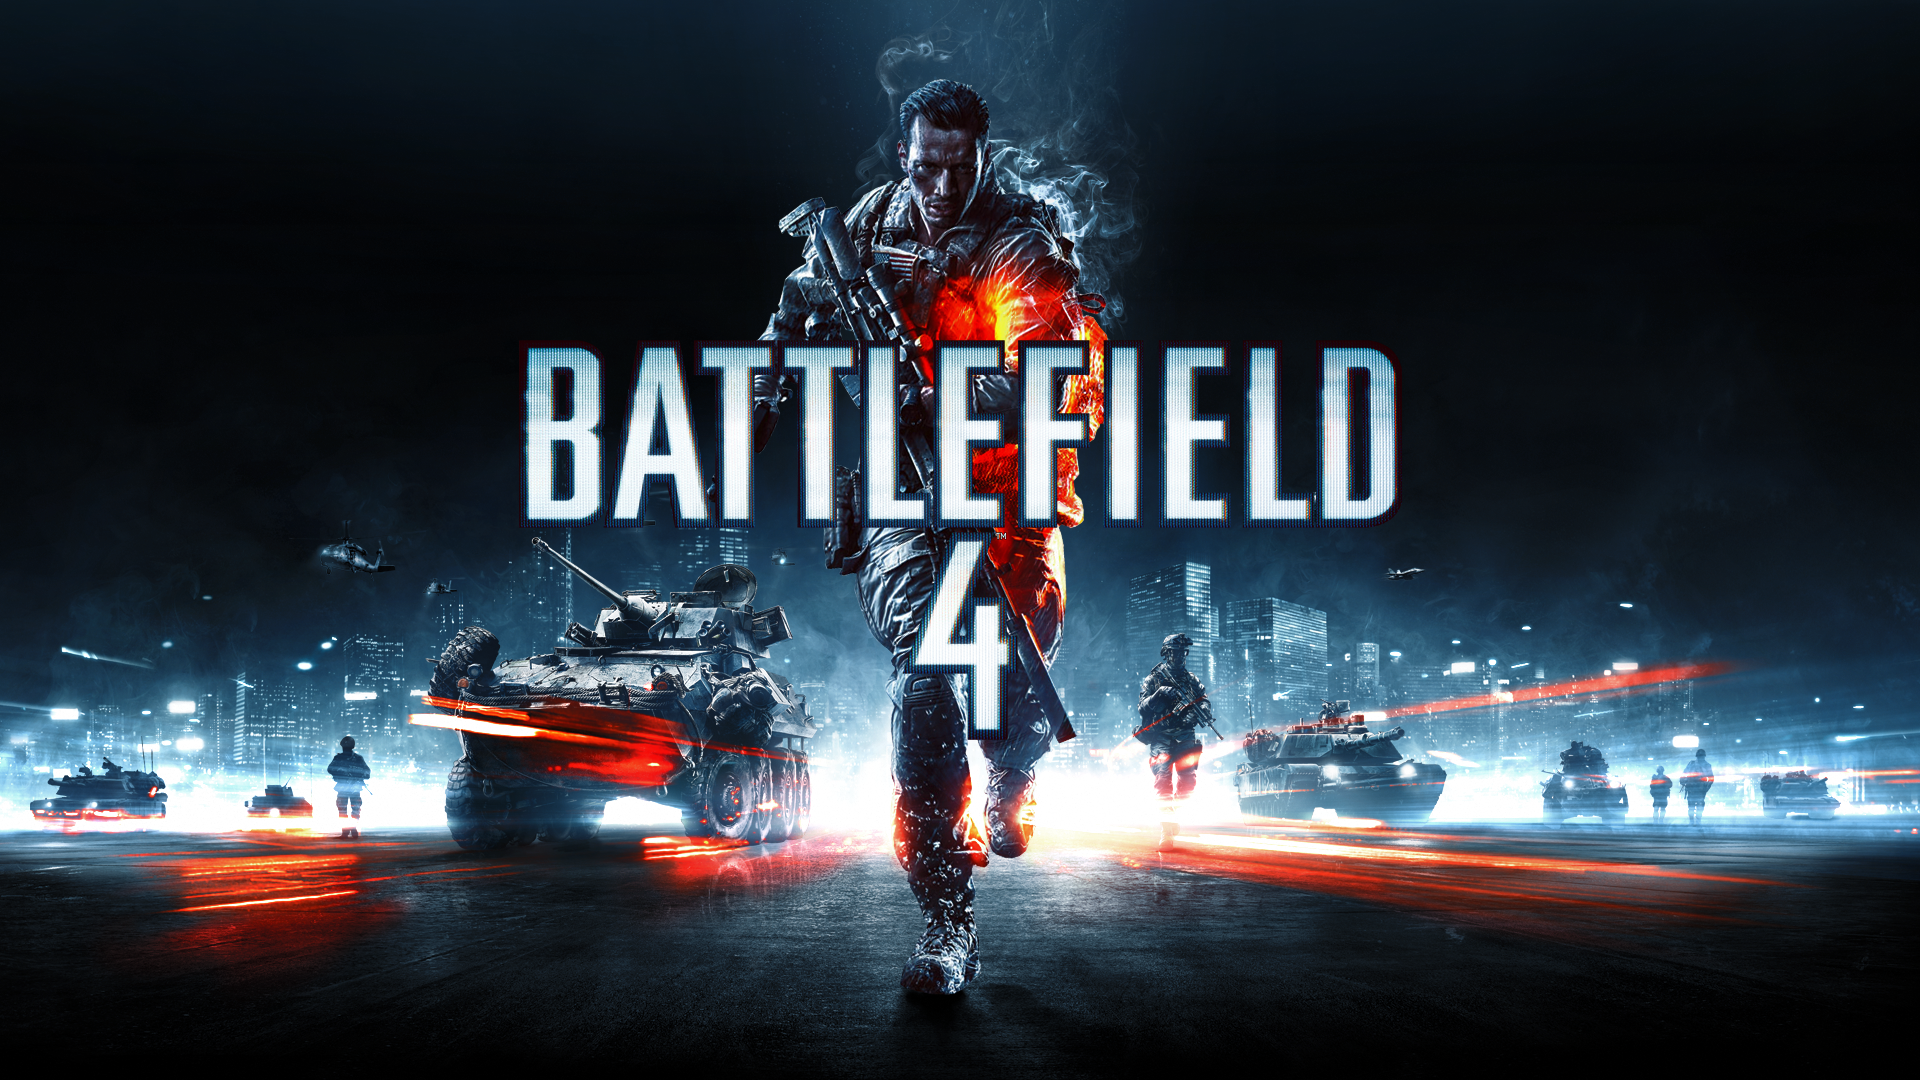 Free Download Battlefield 4 Game Hd Wallpaper Games Wallpapers